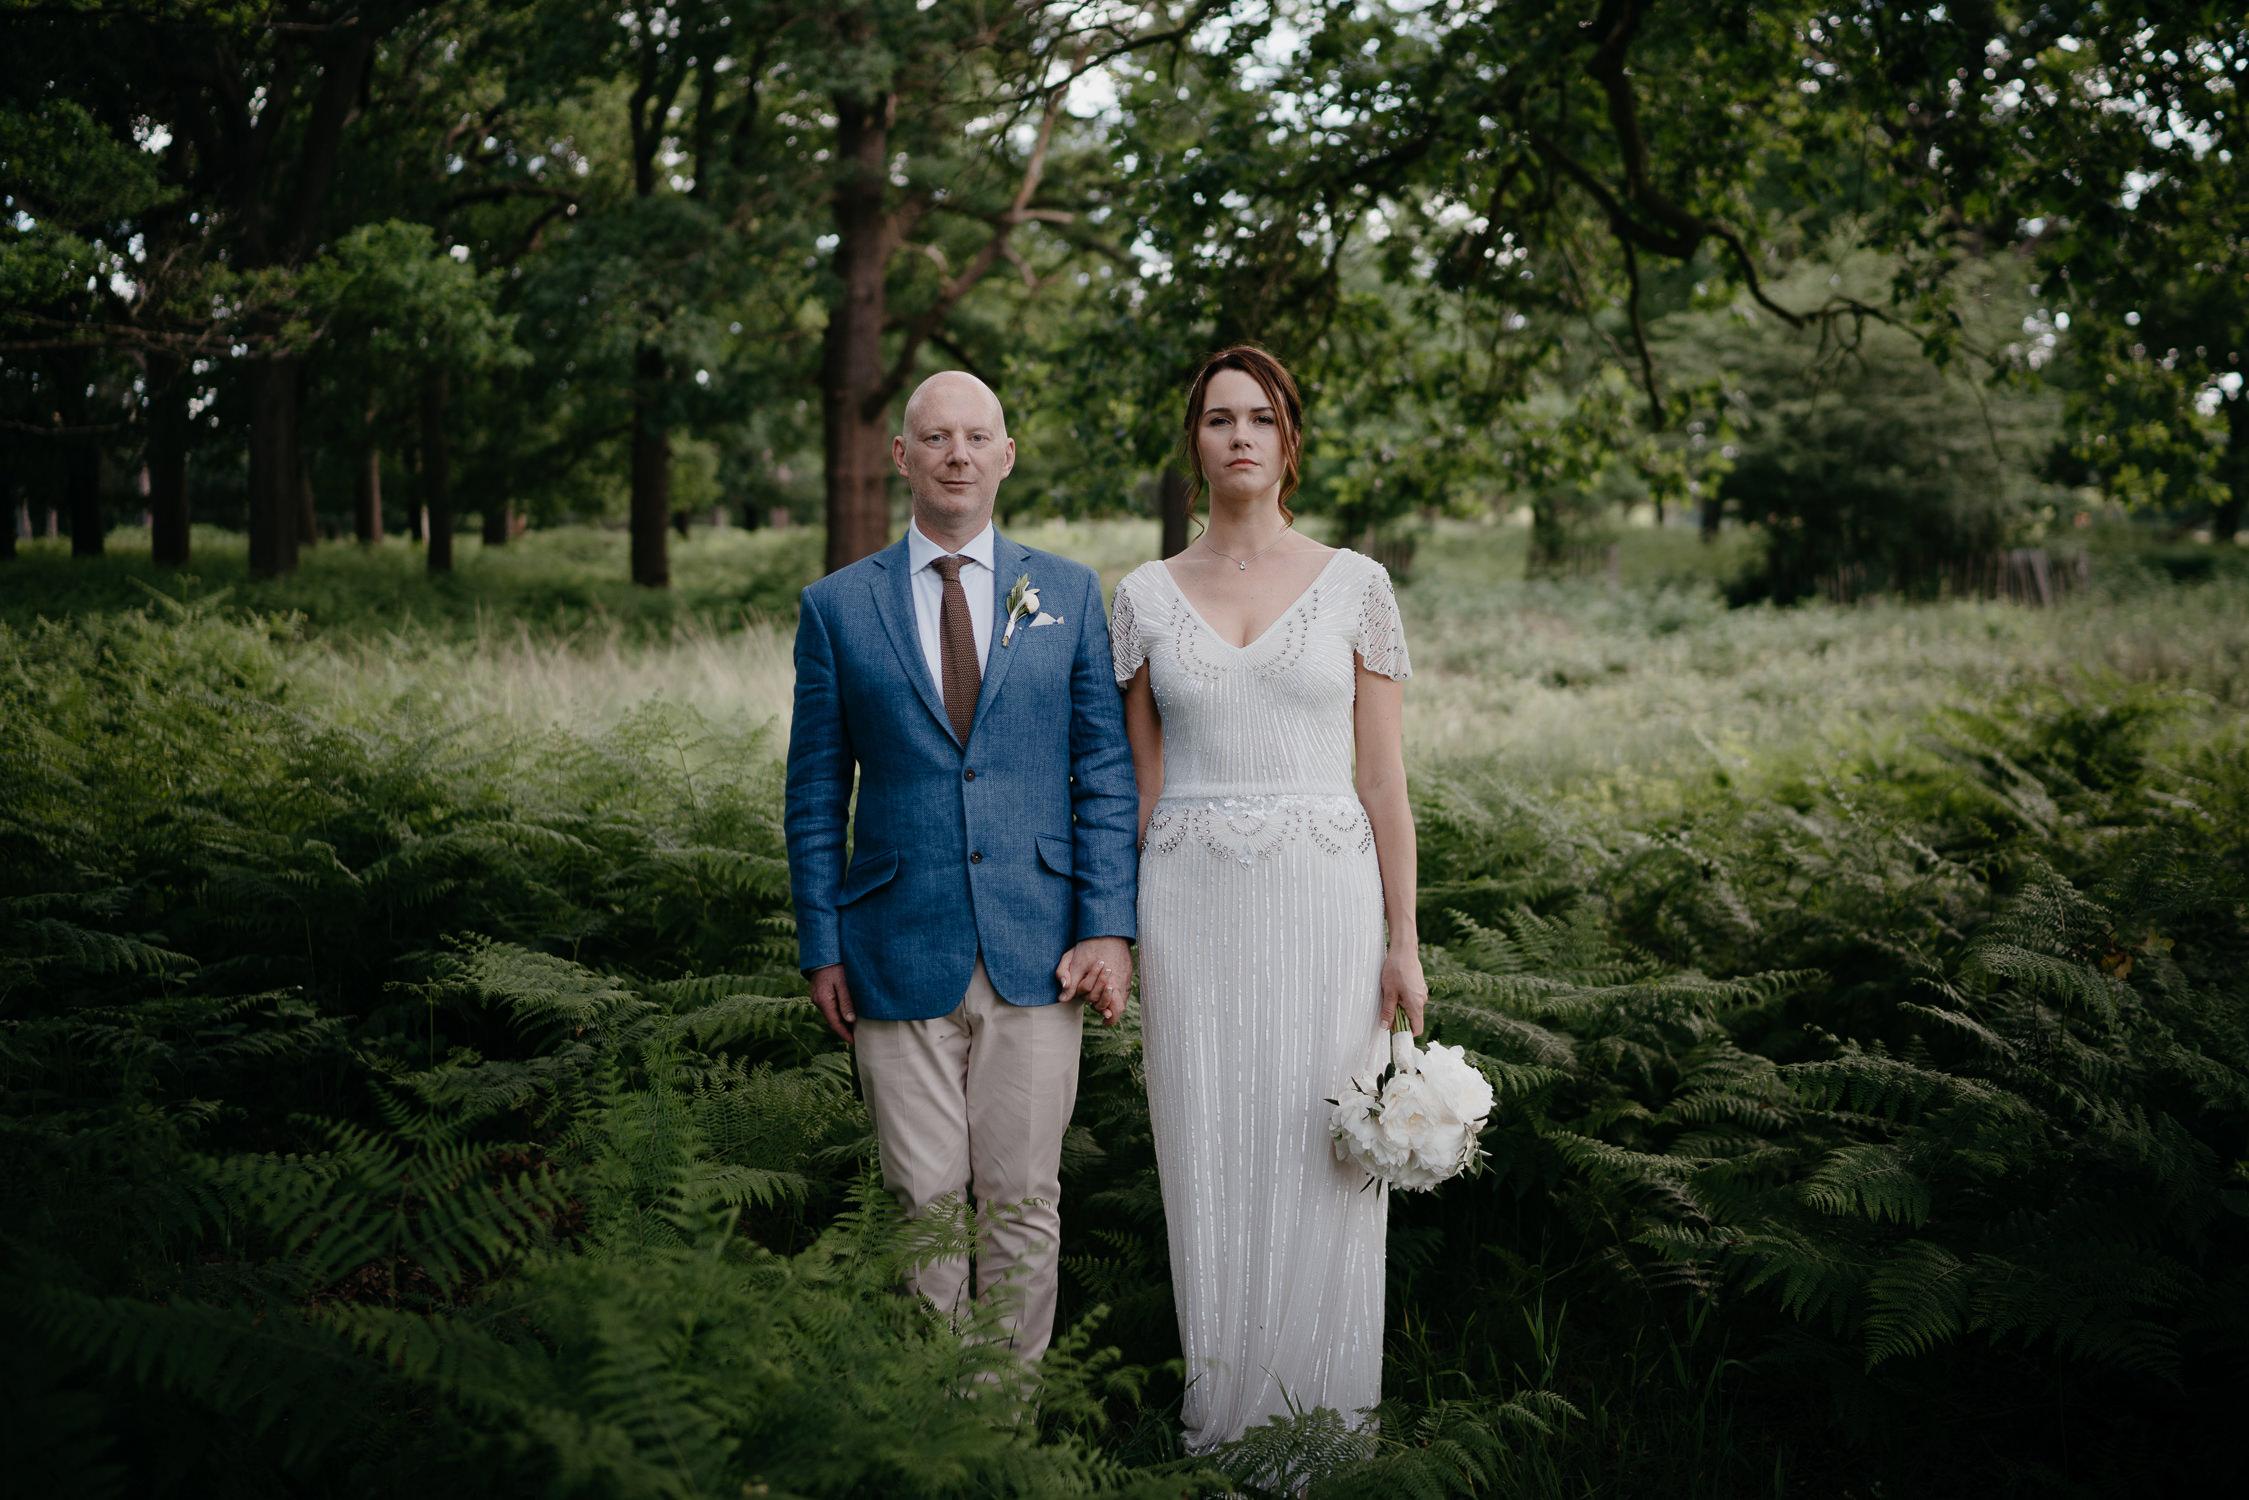 Amazing Destination Wedding Photography London and Amsterdam by Mark Hadden